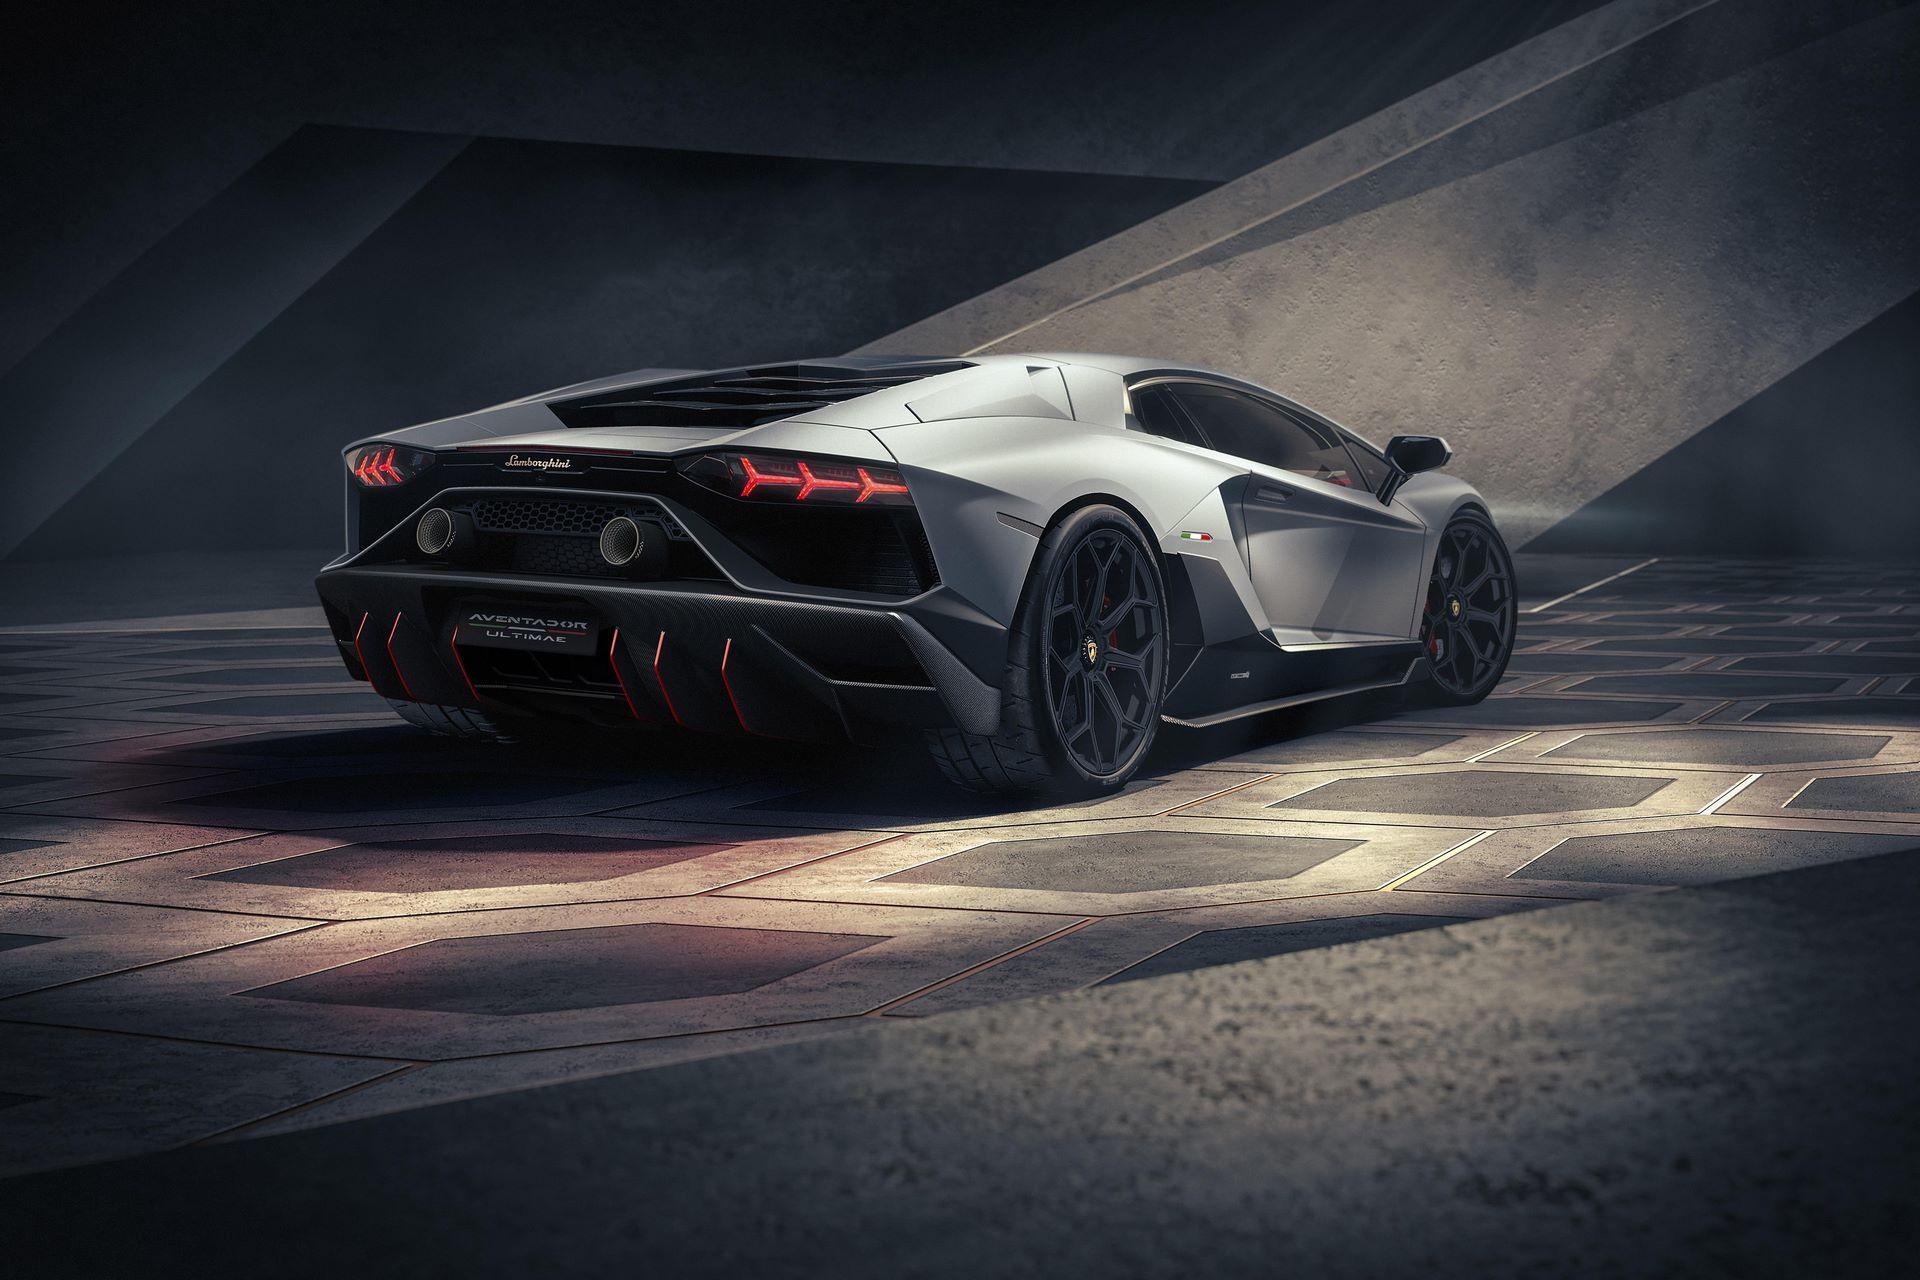 Lamborghini-Aventador-LP780-4-Ultimae-16